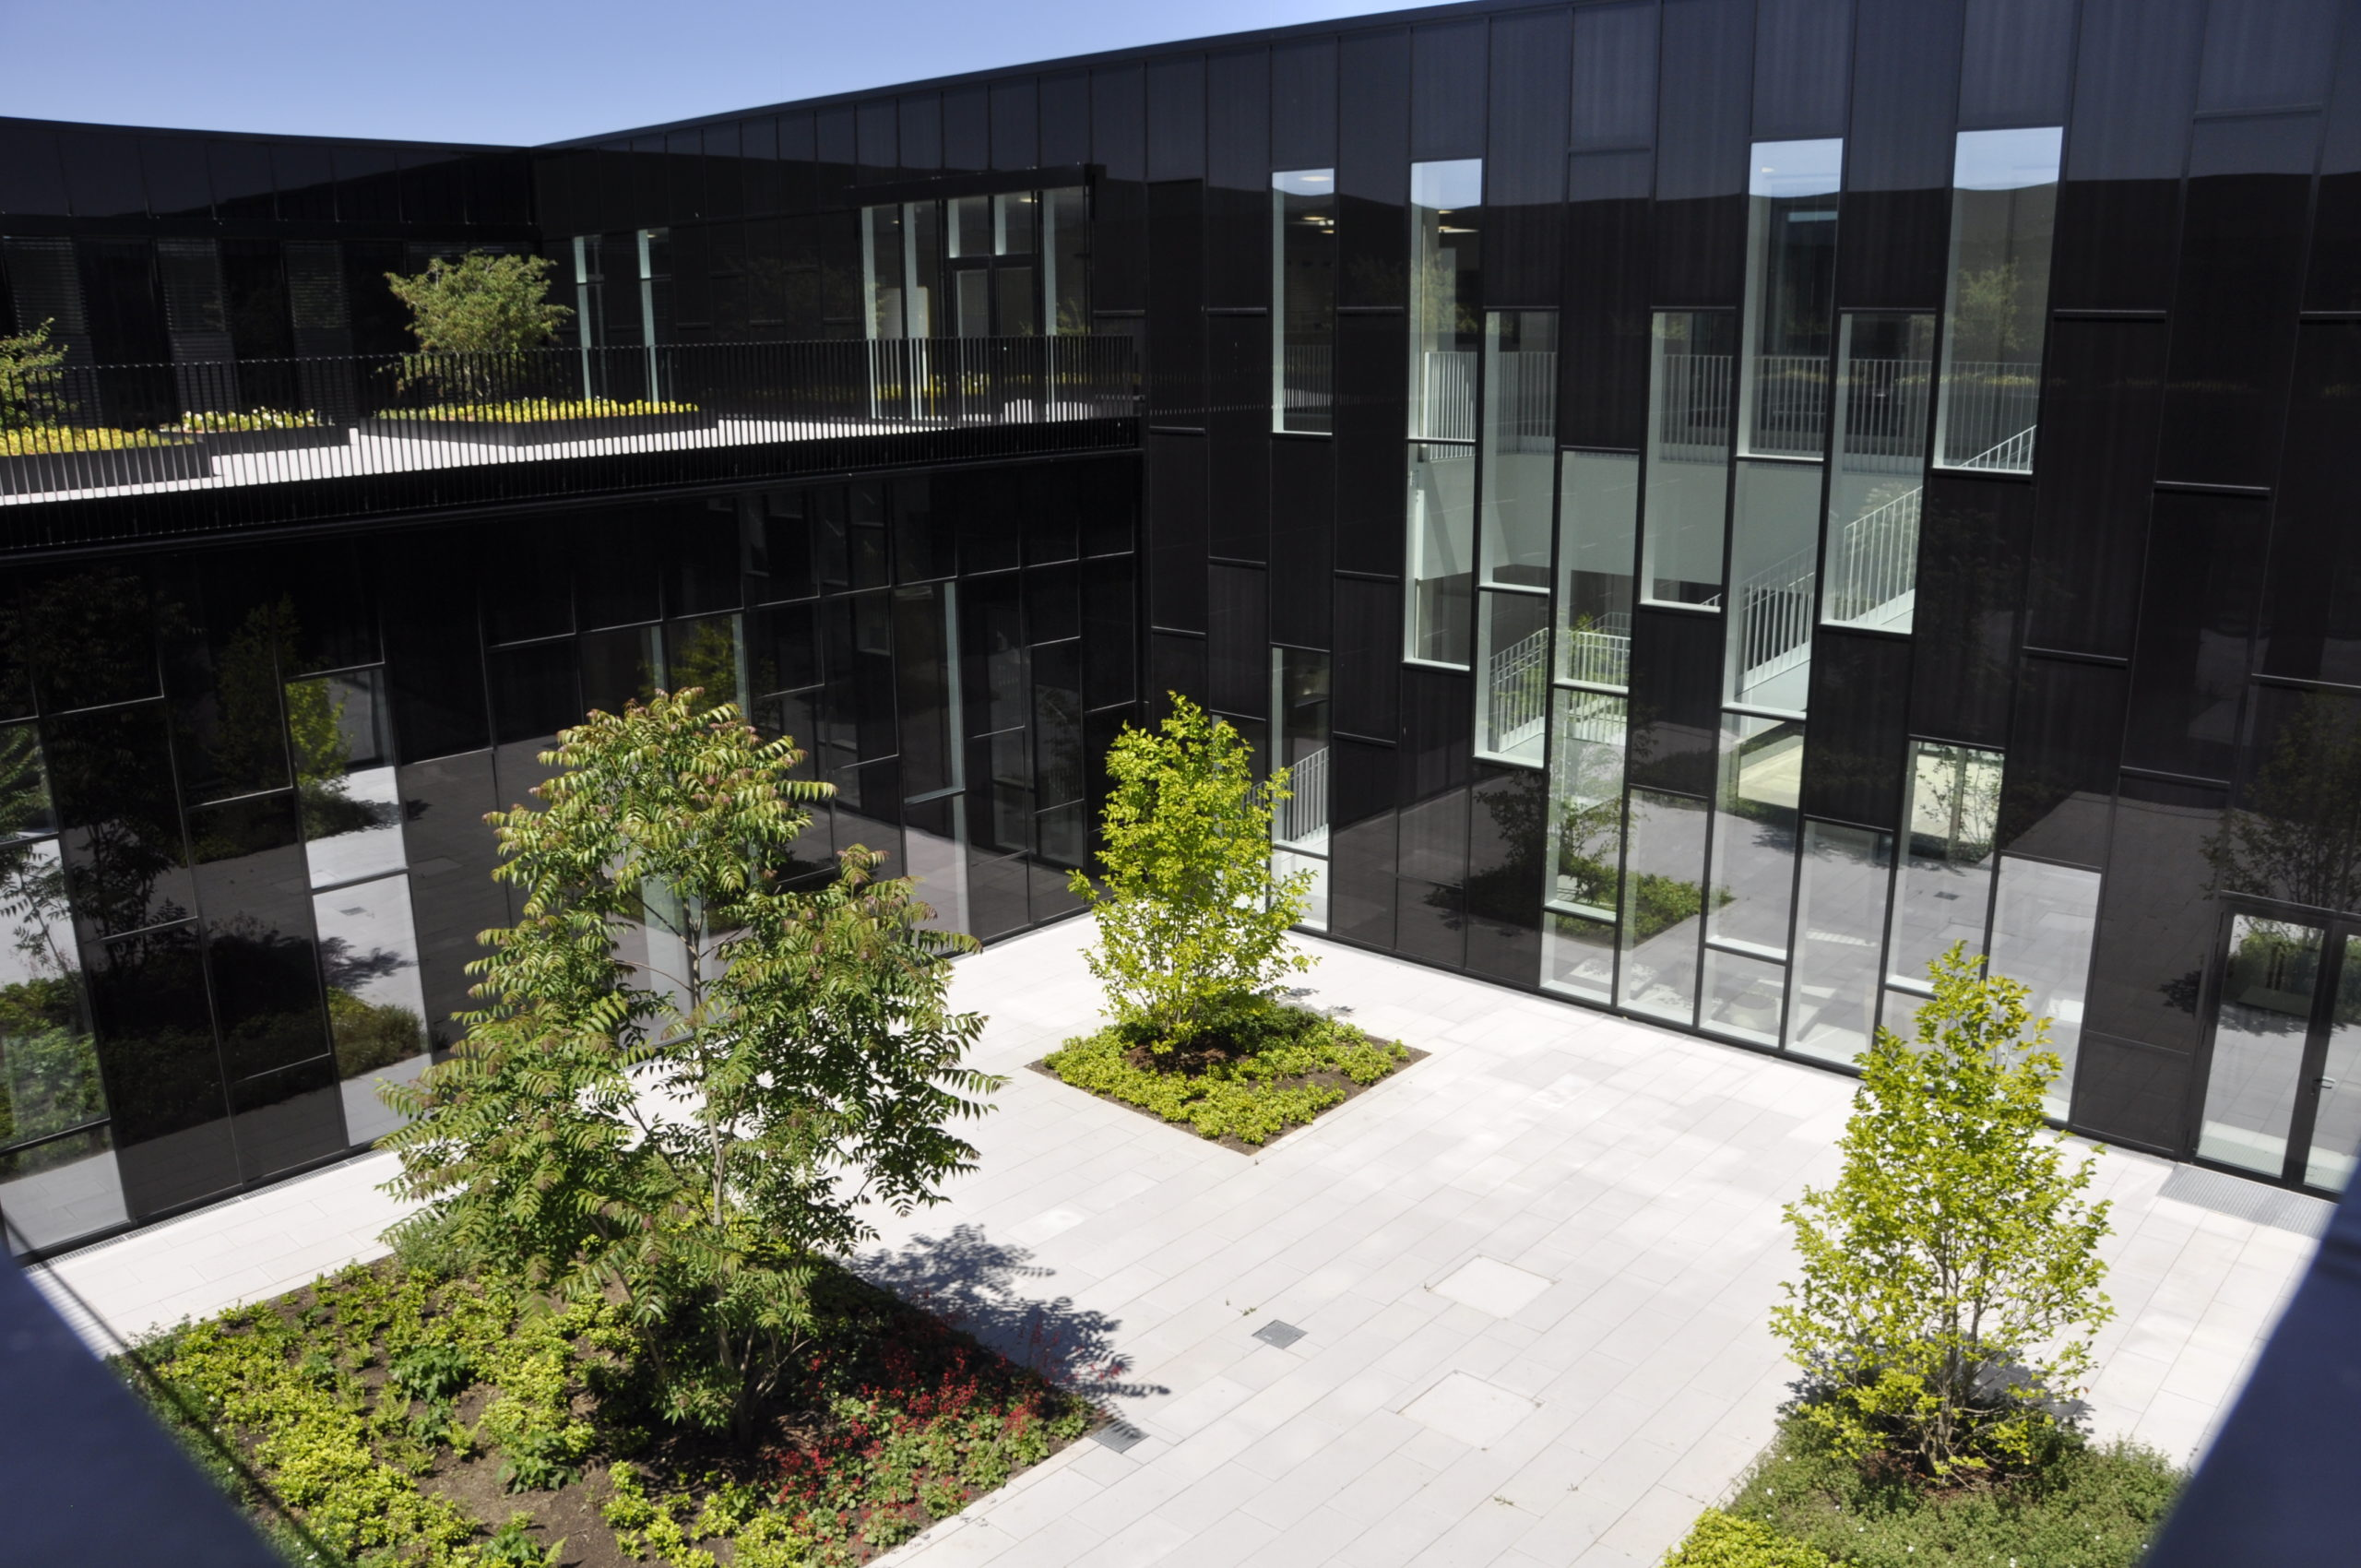 Blick in den Innenhof des neuen Institutionsgebäude im Augsburger Innovationspark